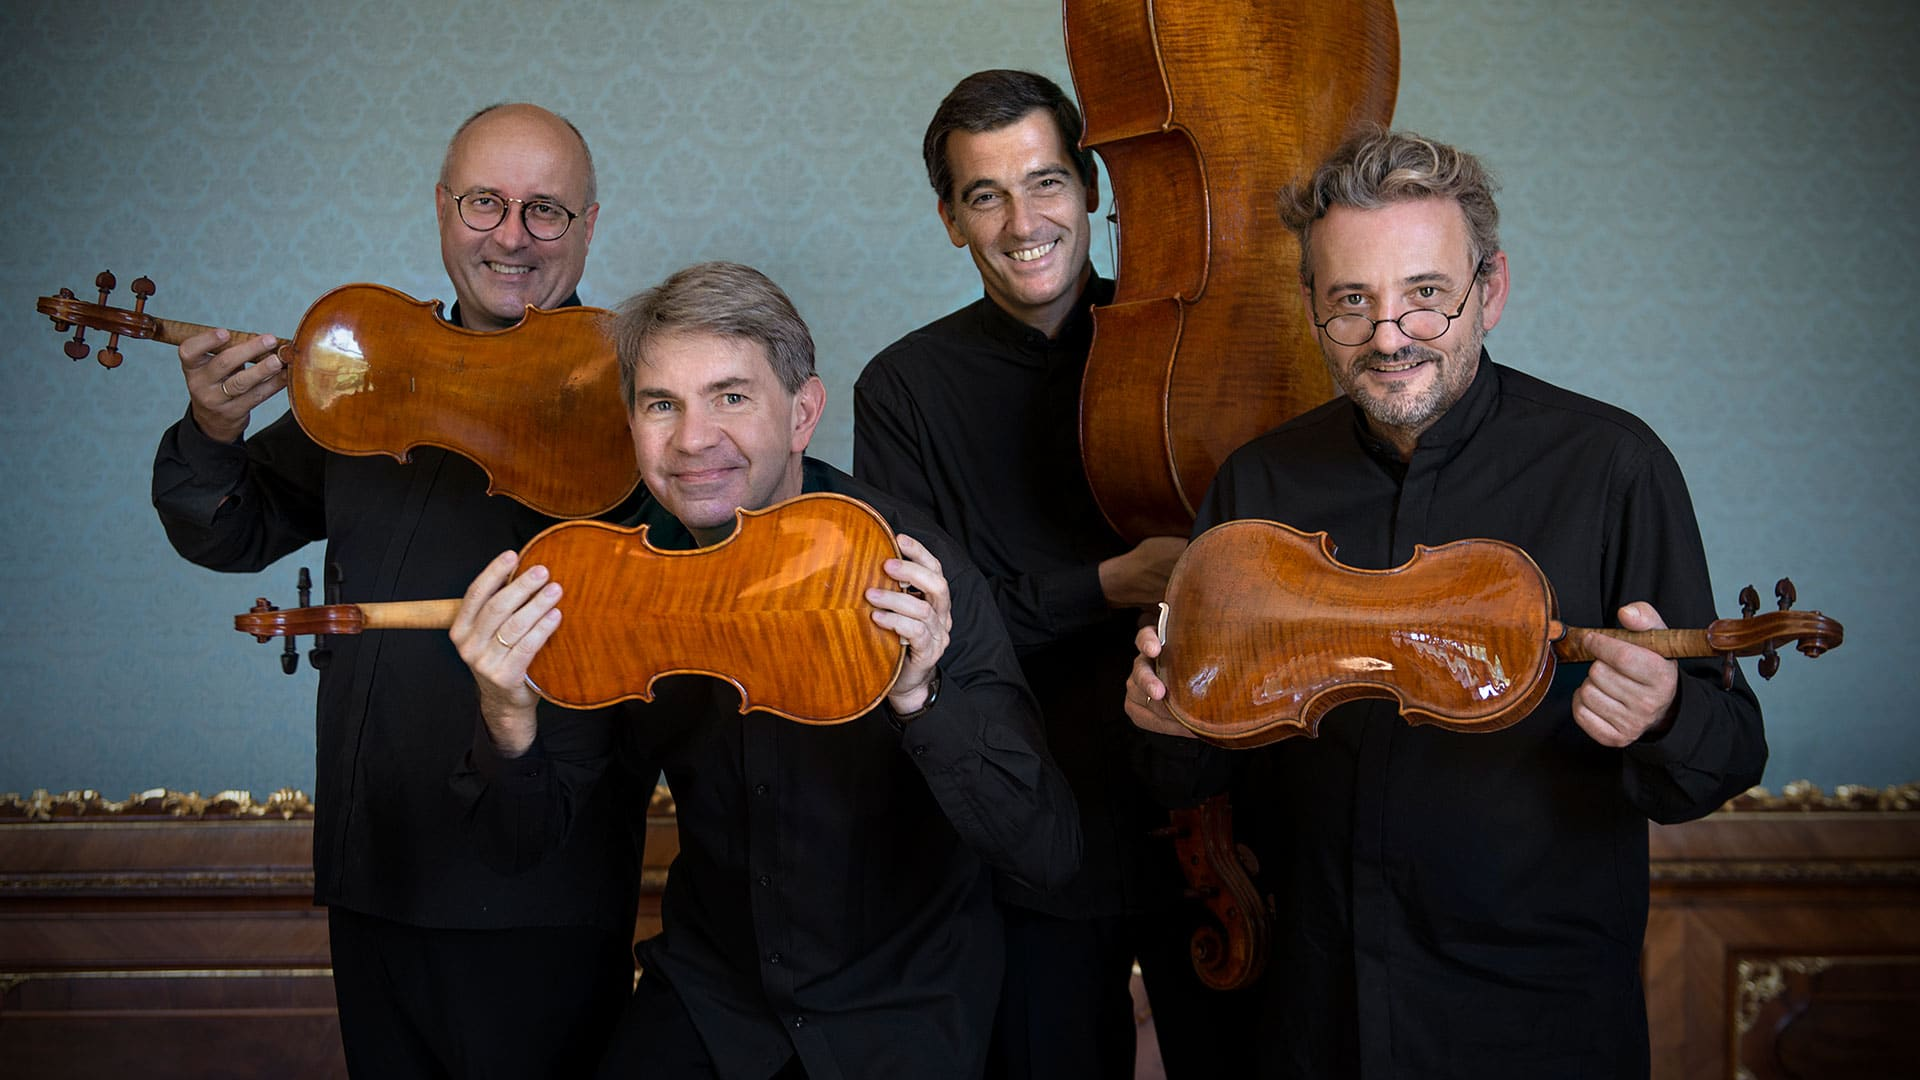 Artis Quartett © Nancy Horowitz (2)